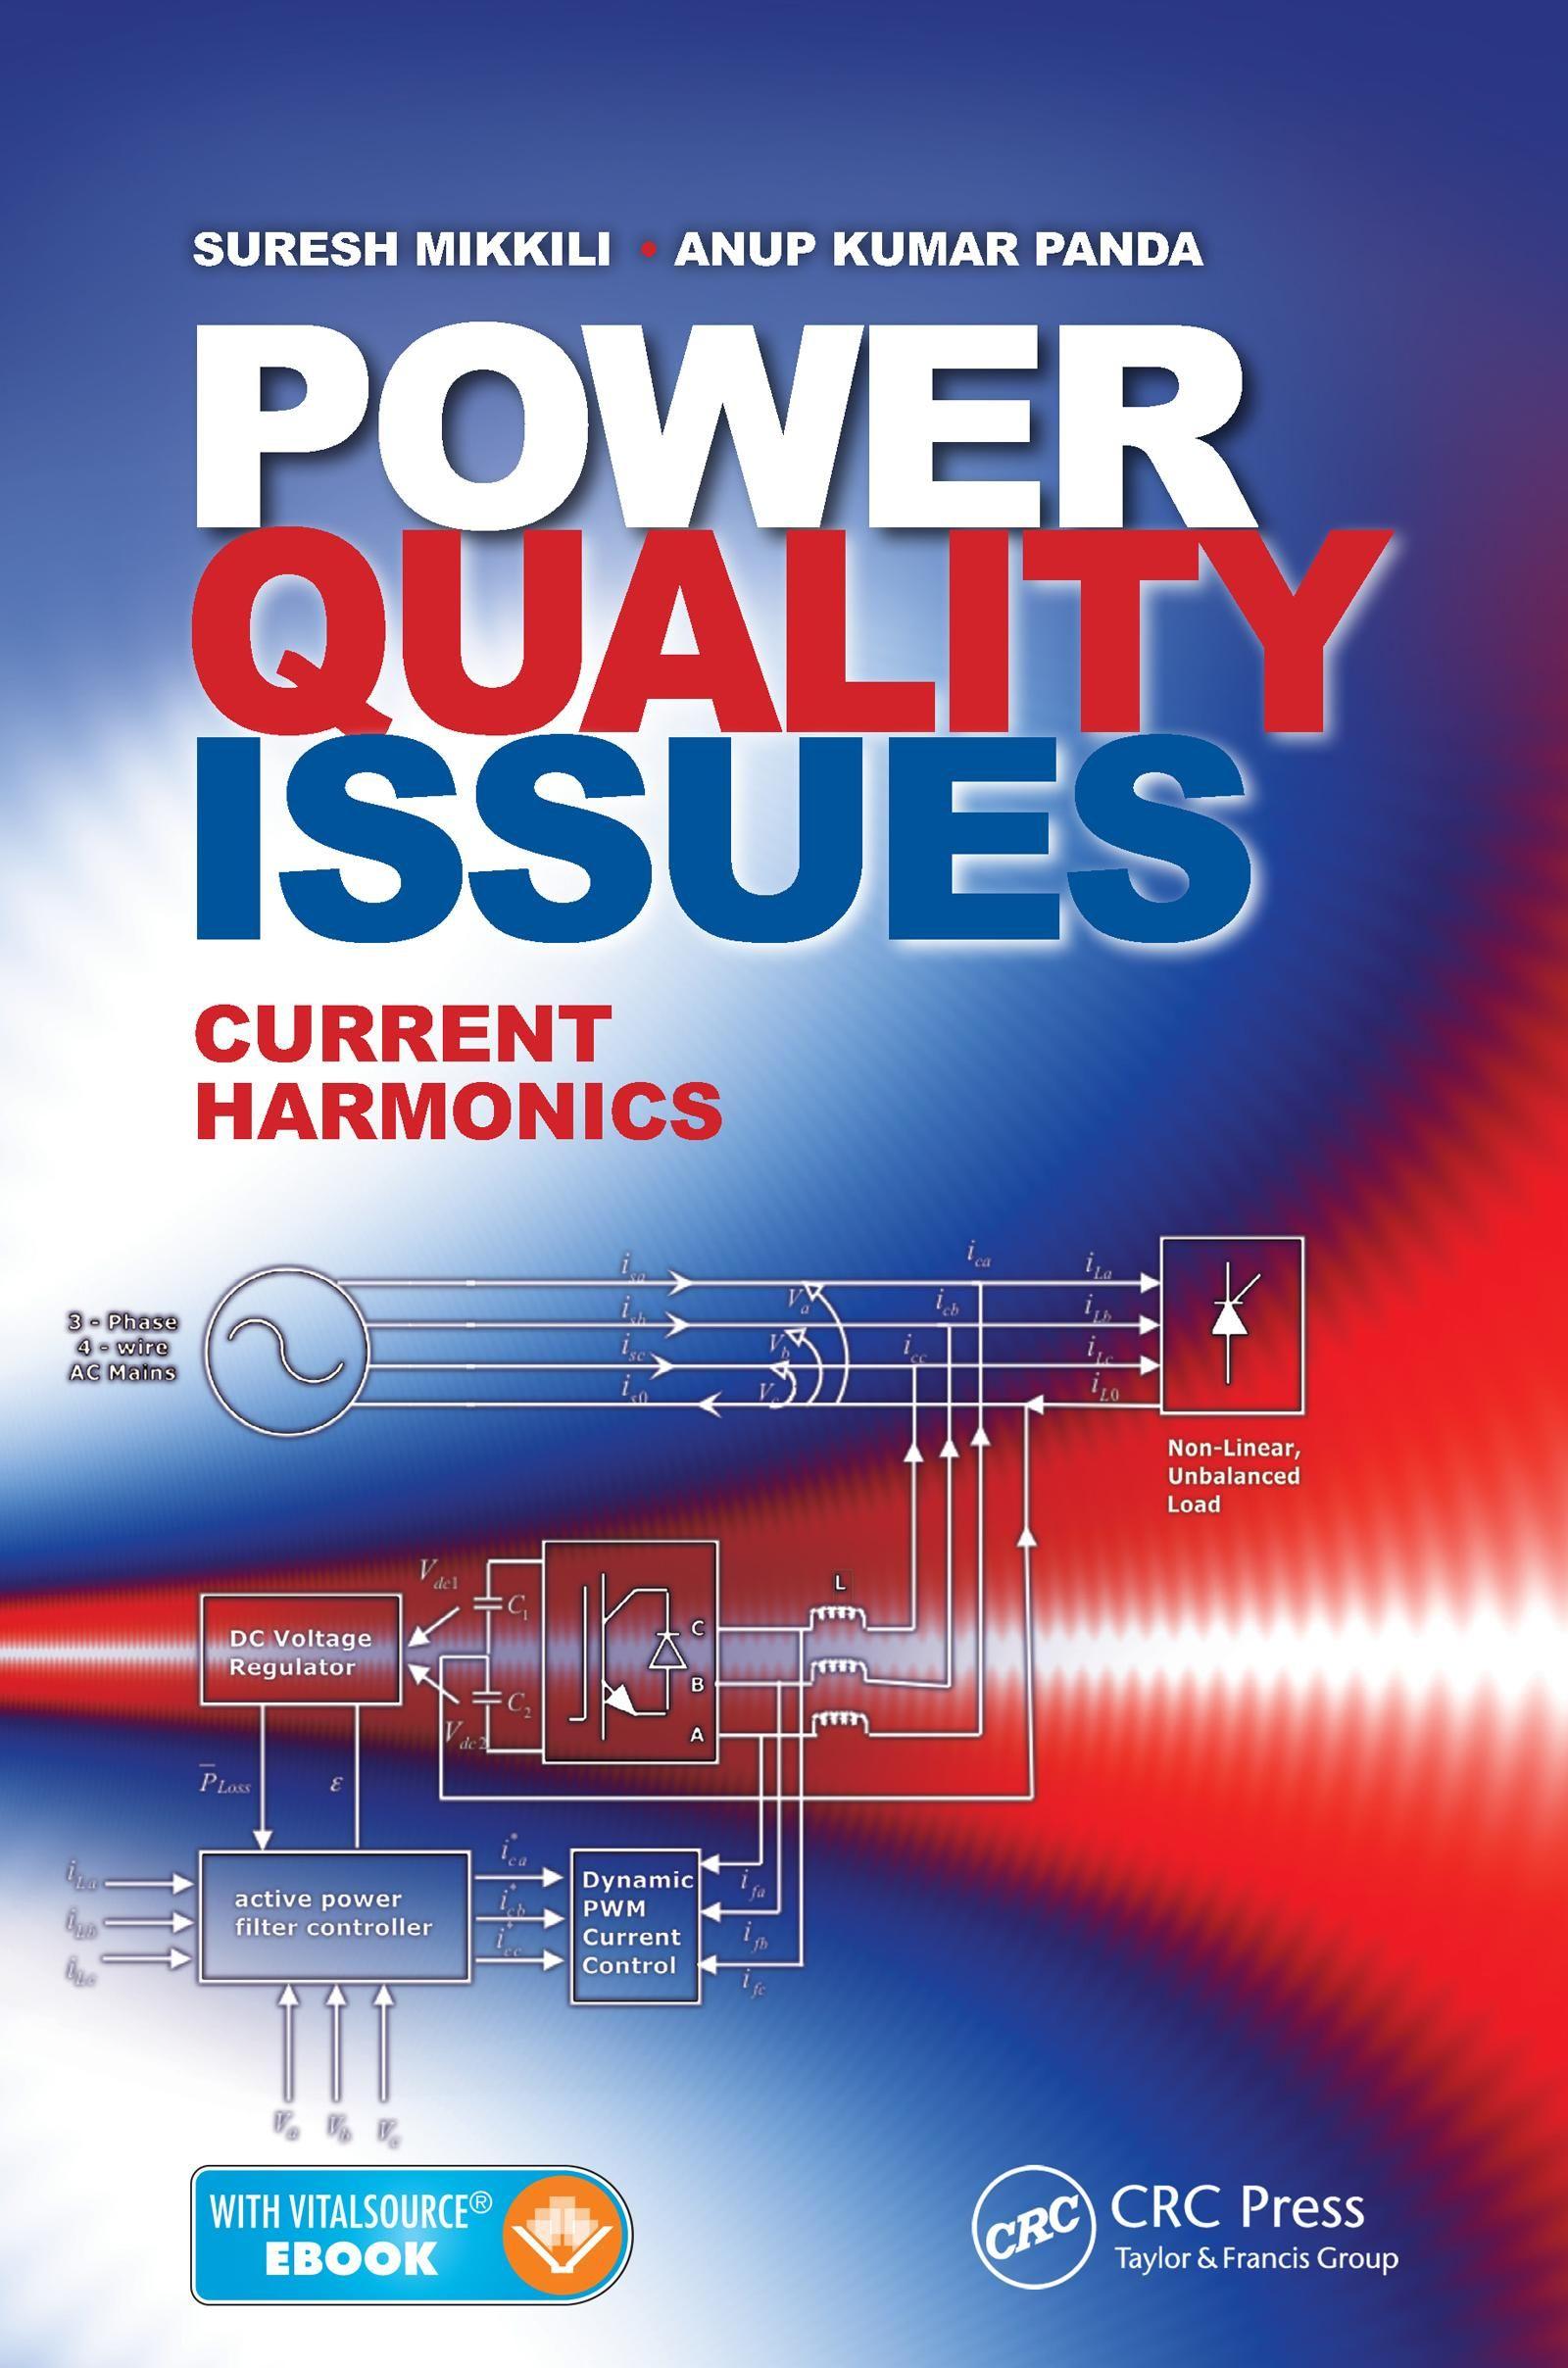 Power Quality Issues Iet Wiring Regulations Book Redshelf Crc Press Adorewecom